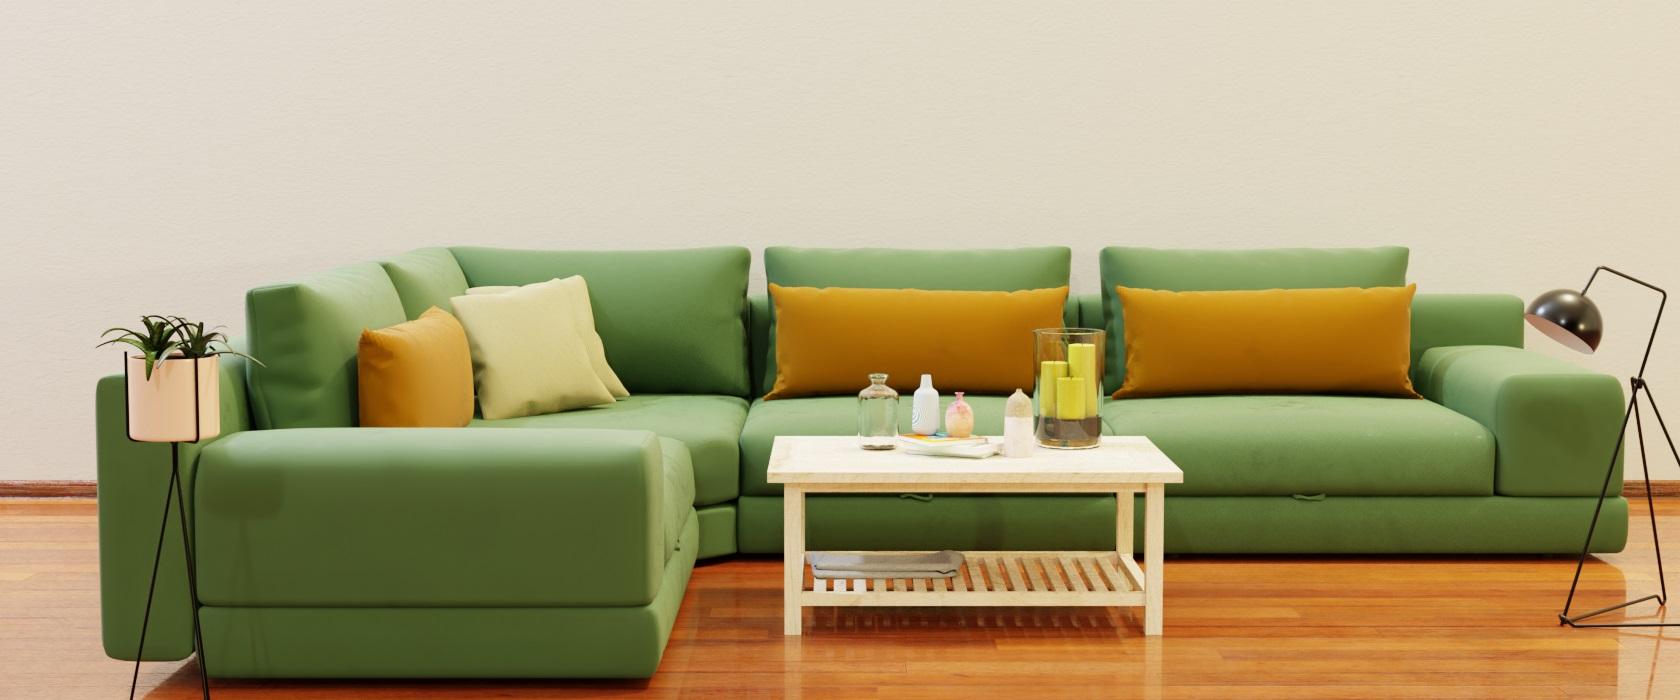 Модульний диван Dario 355x255 - Фото 2 - Pufetto